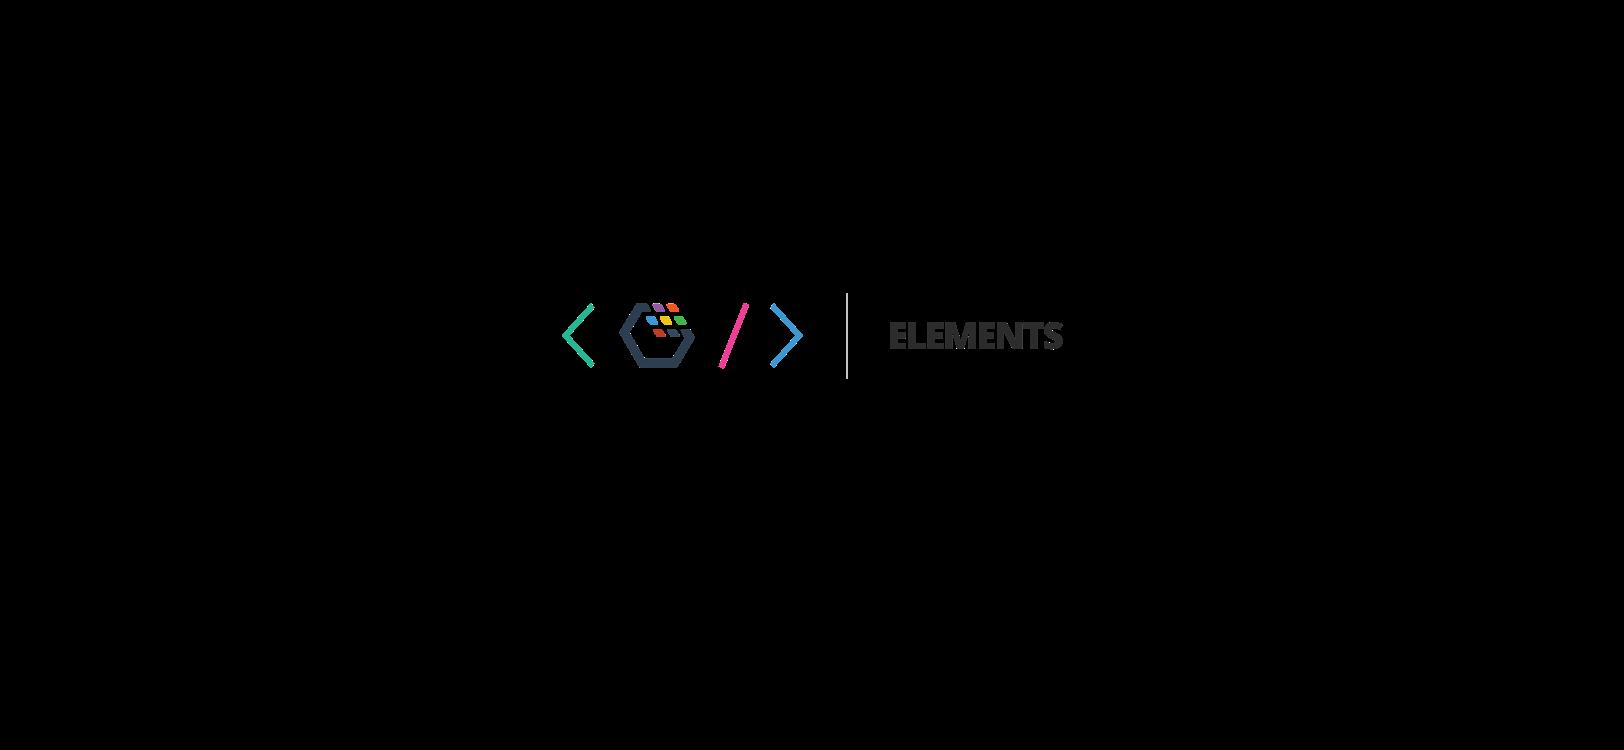 @allthings/elements